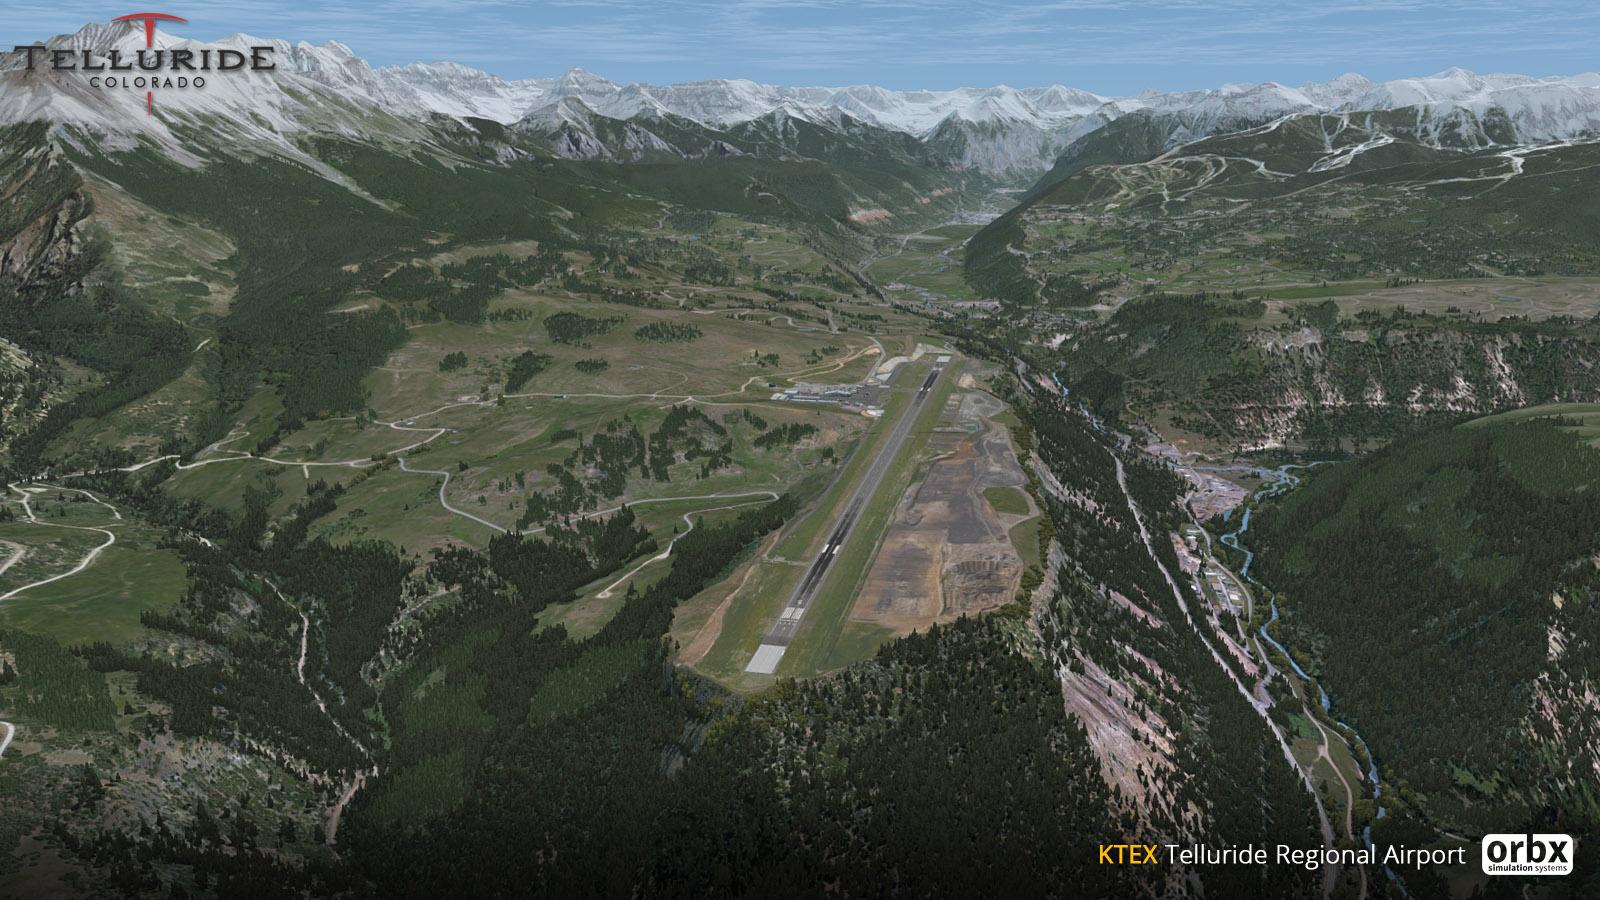 ORBX Telluride Regional Airport (KTEX) - preview